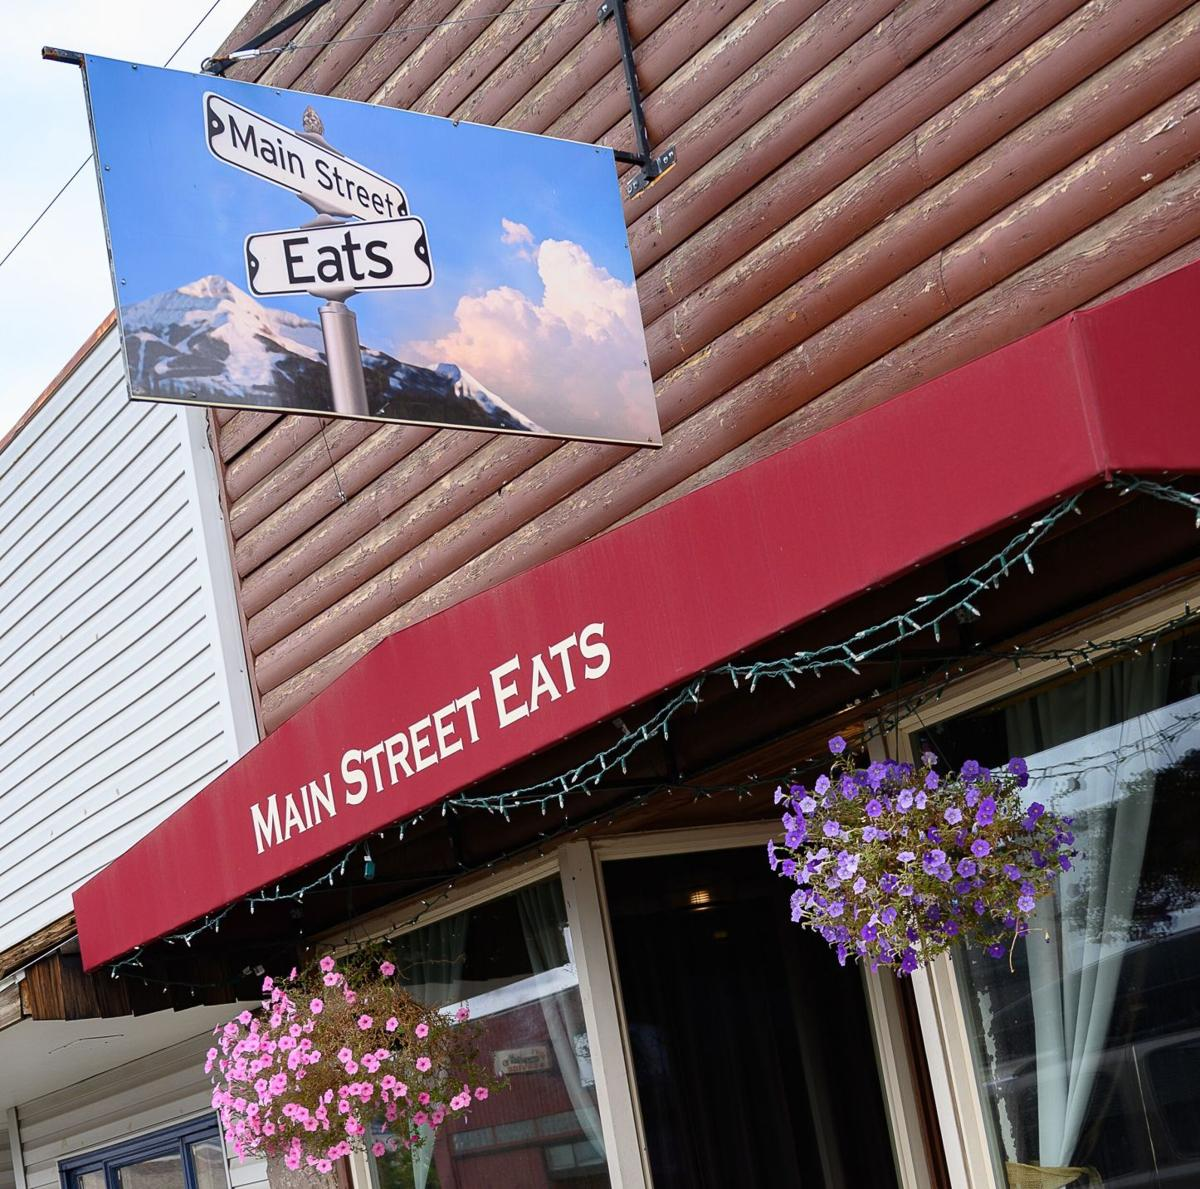 Main Street Eats